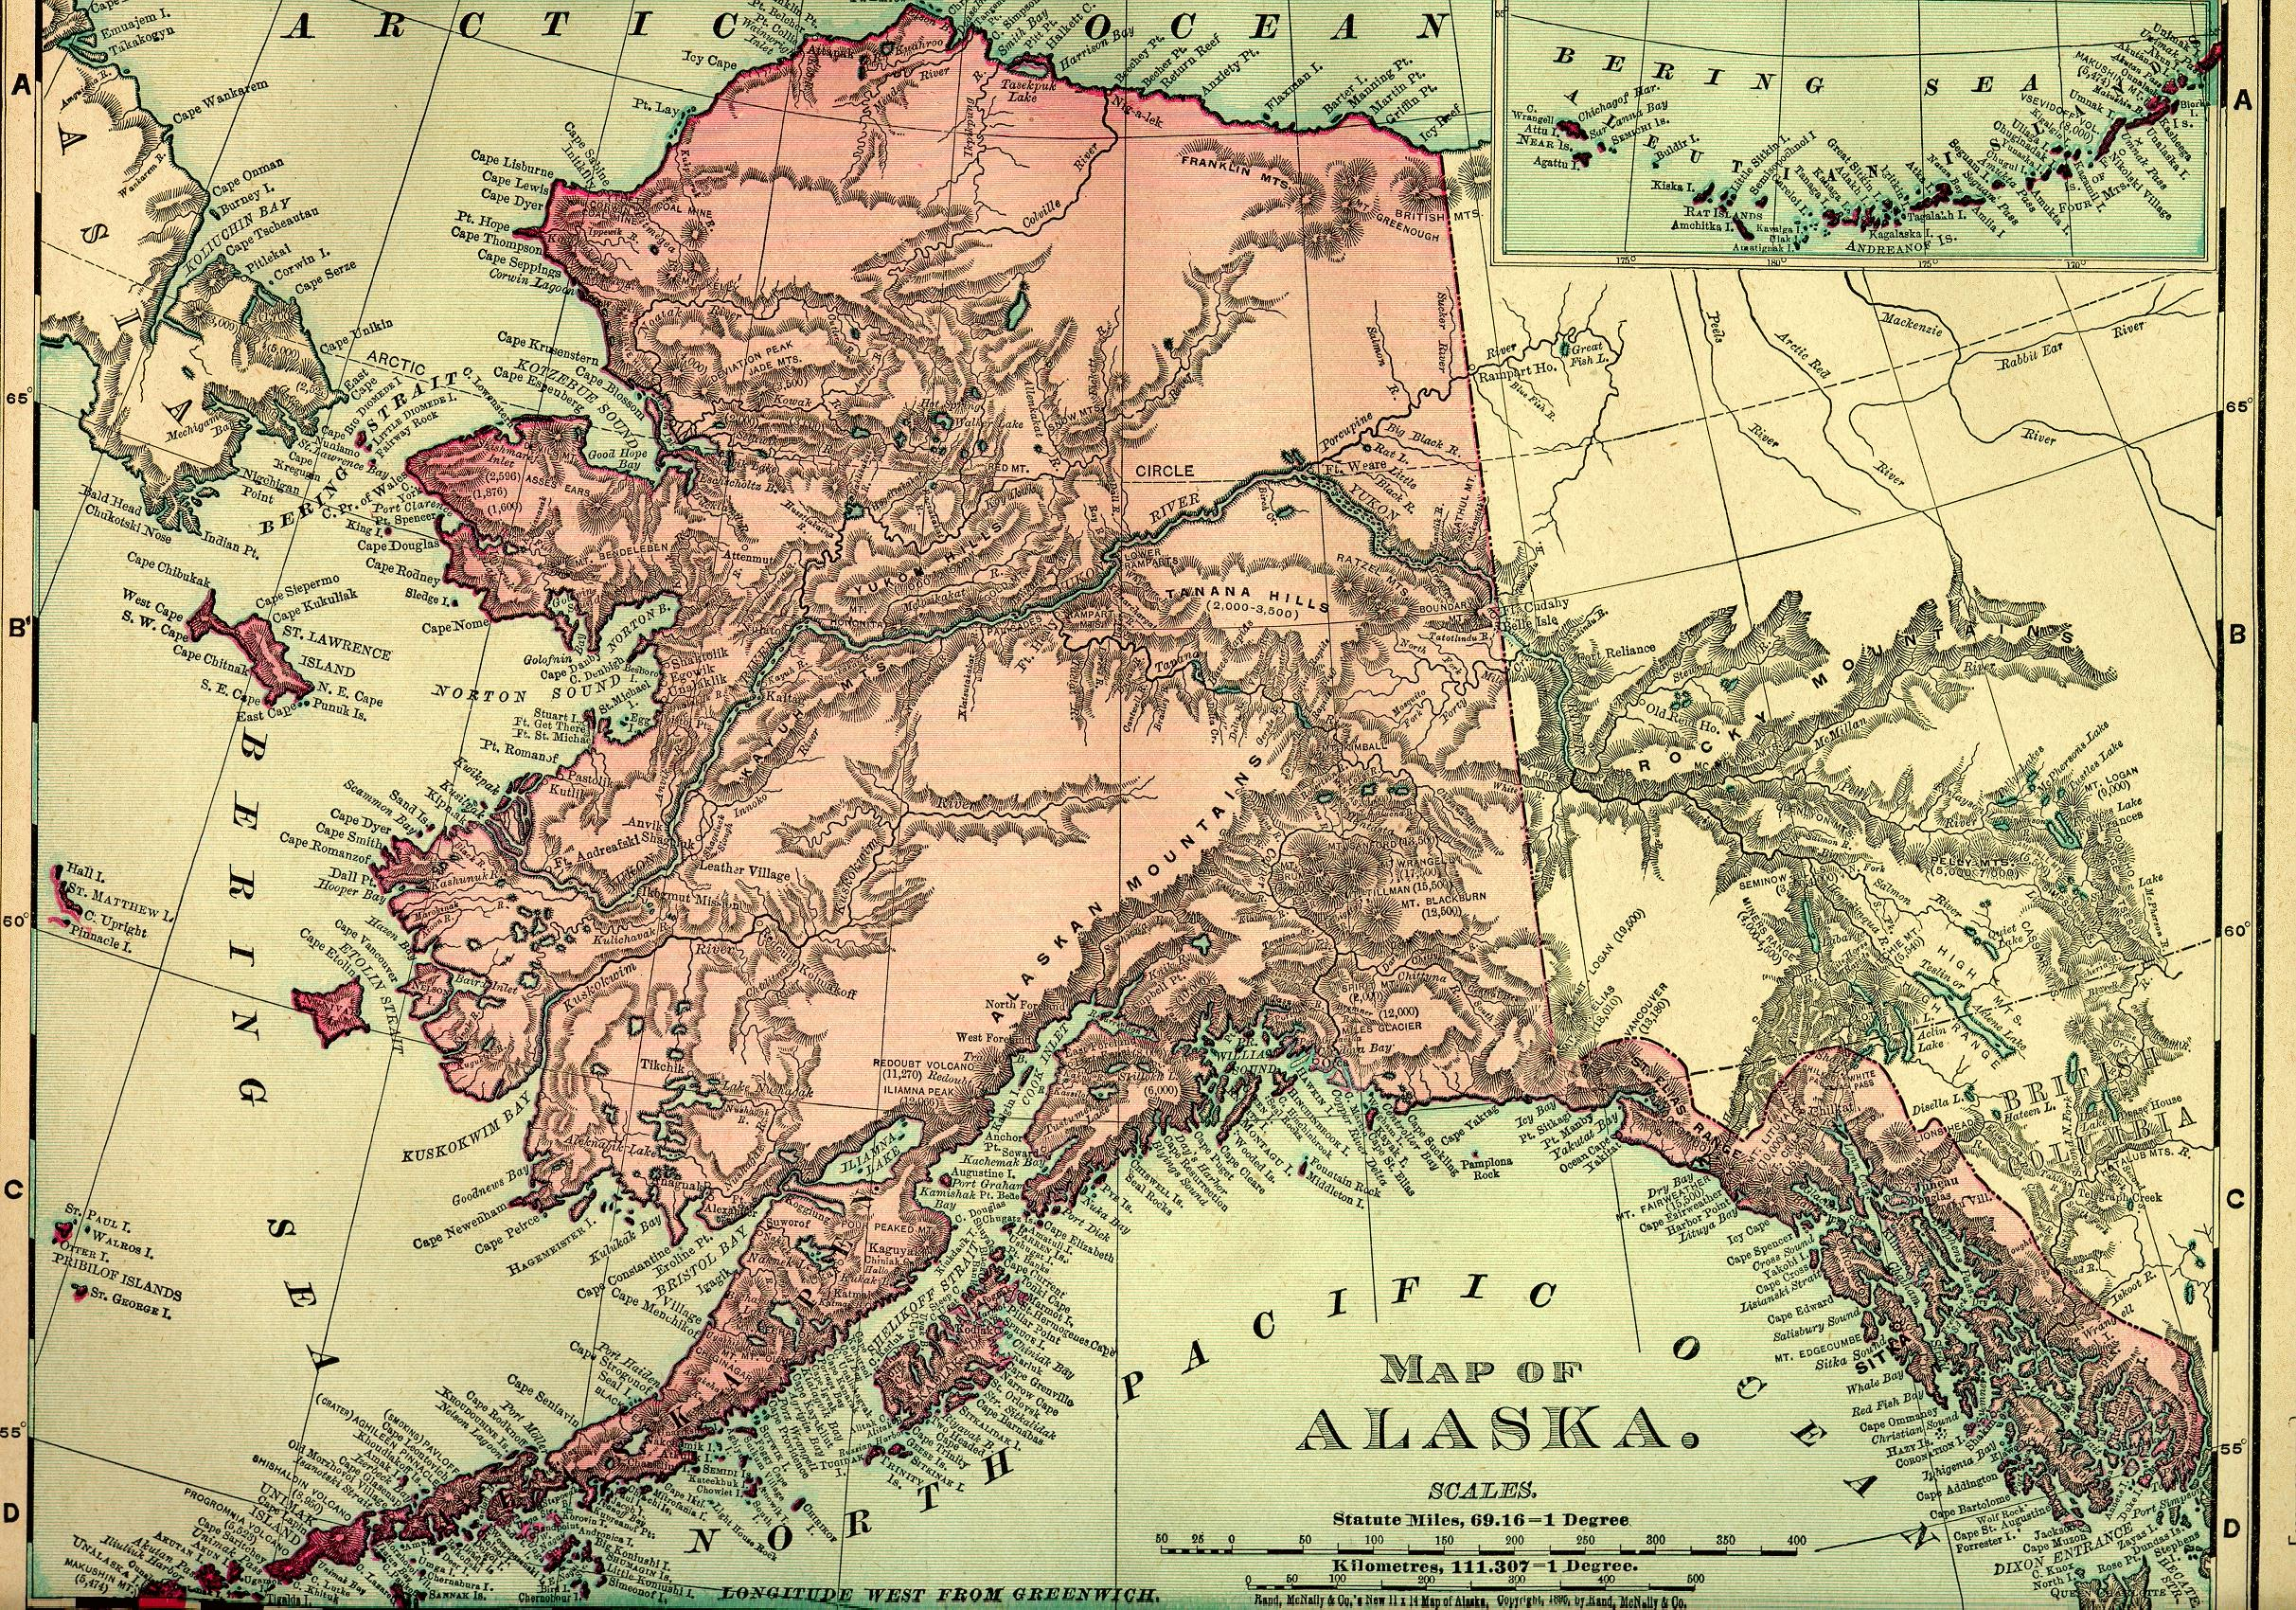 Alaska 1895 Map